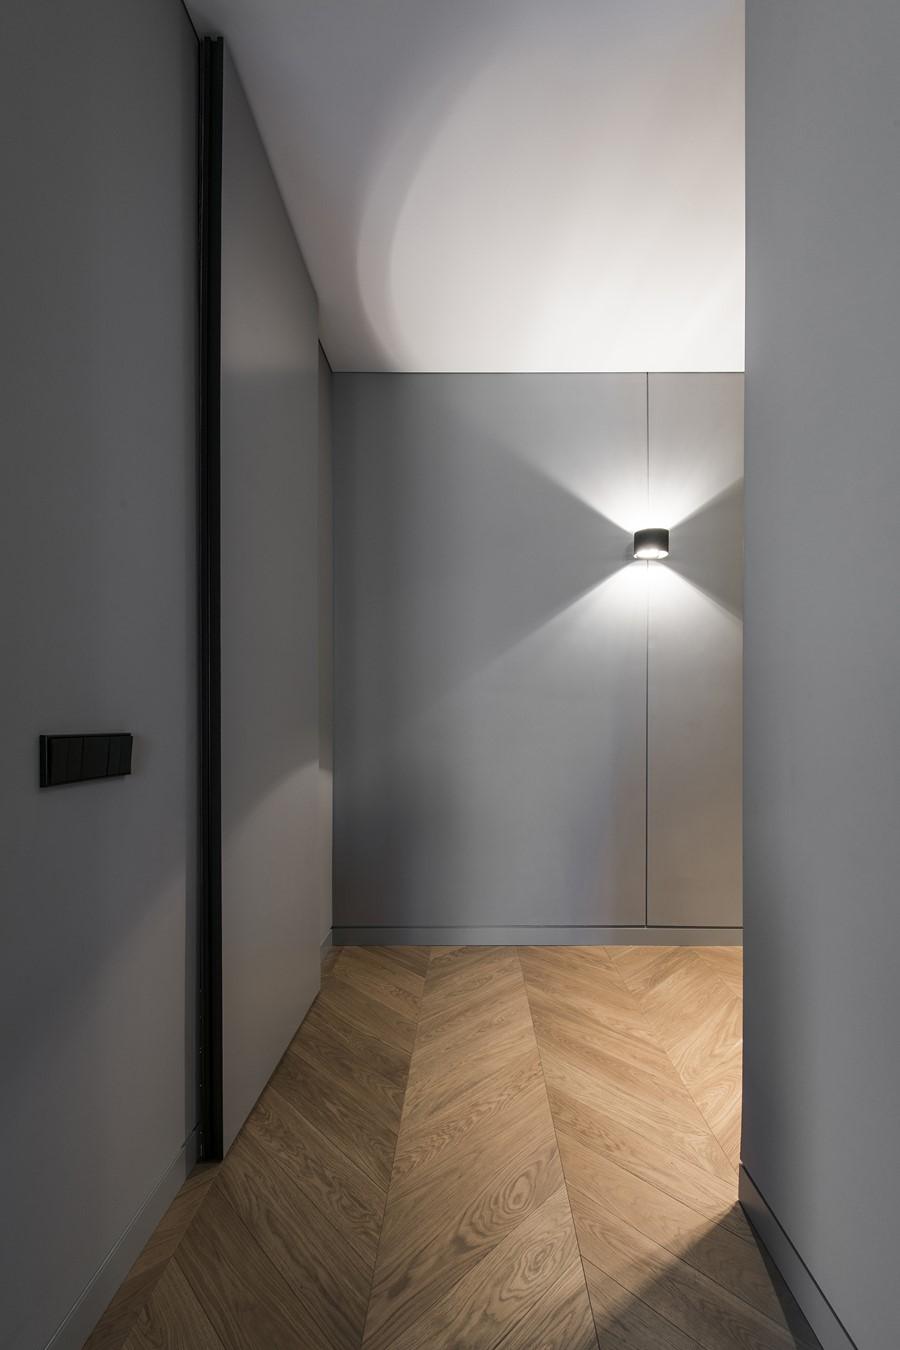 interior-design-by-normundas-vilkas-08